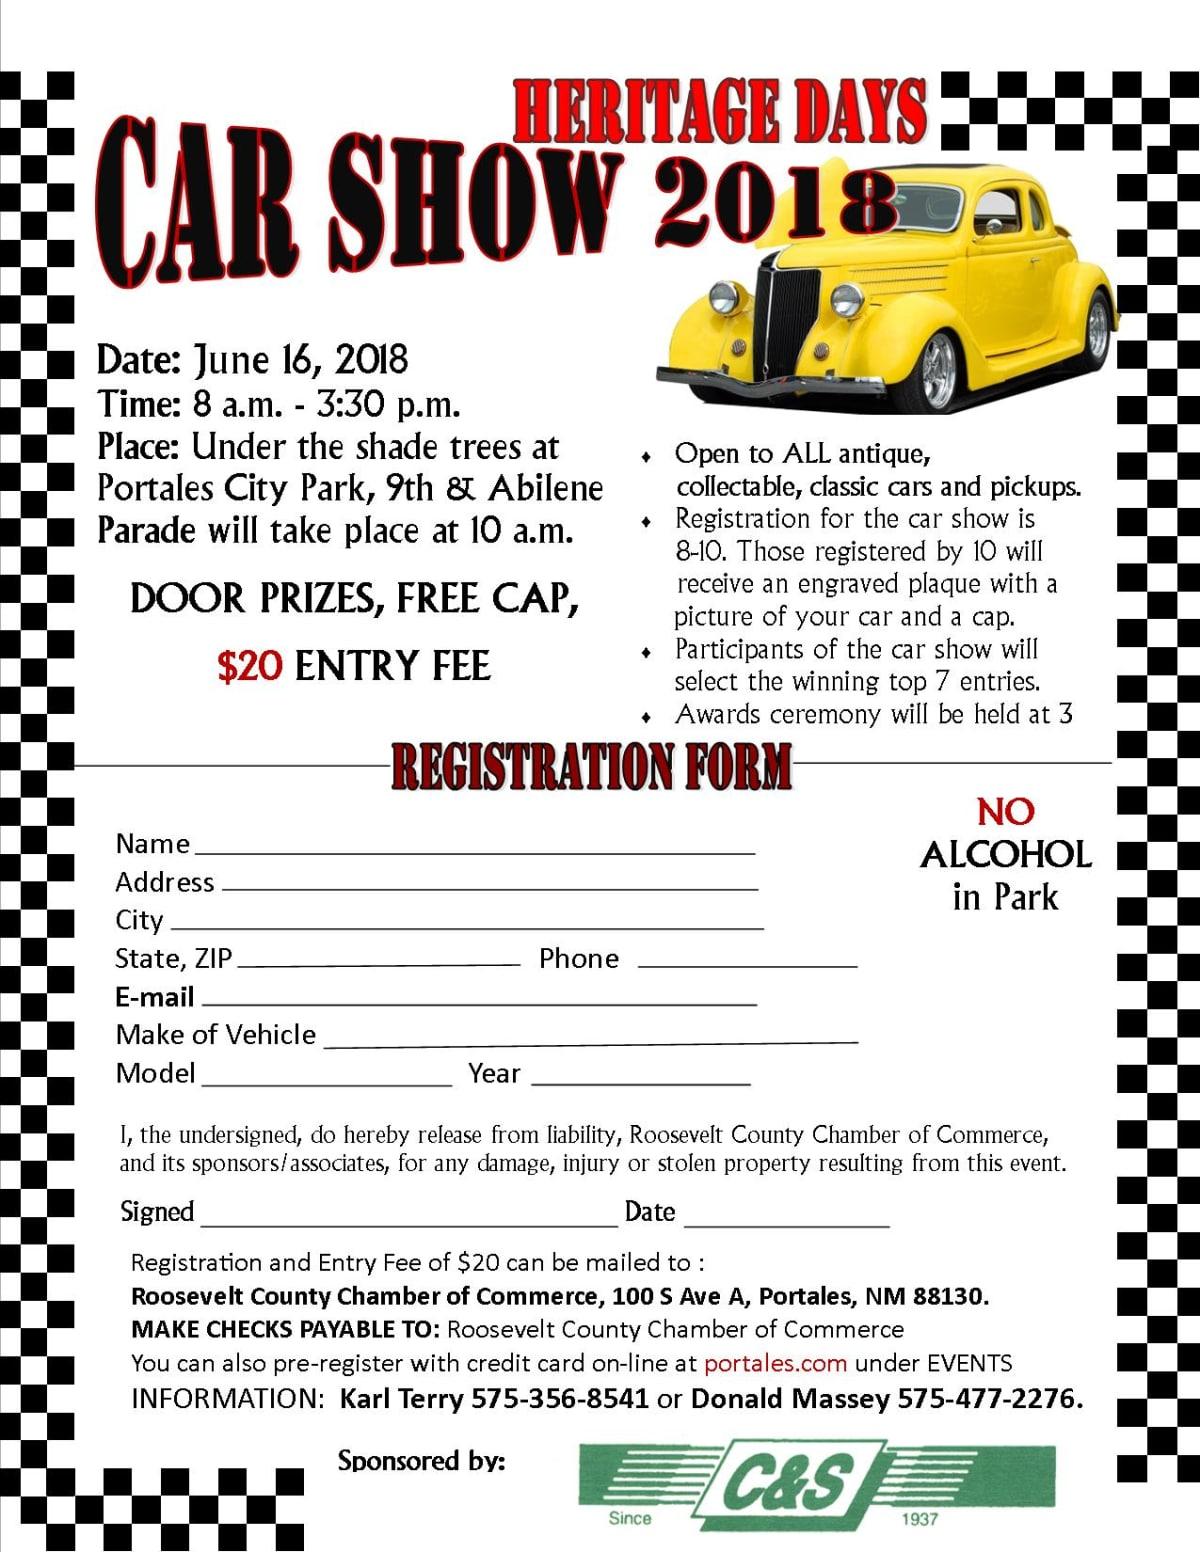 CarShowRegistrationForm2018-w1200.jpg